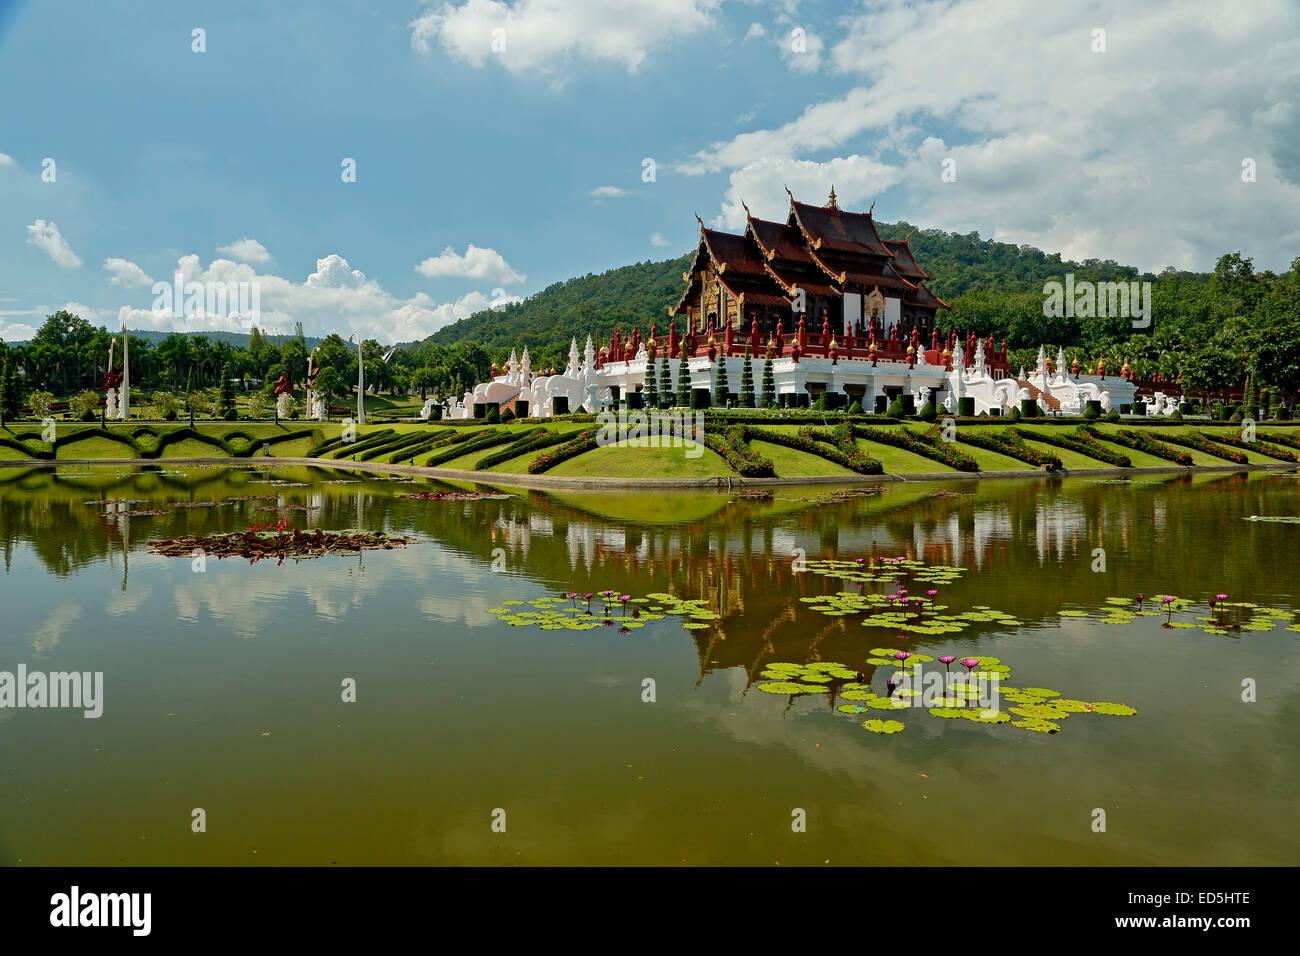 Royal Pavilion, reflejada en el estanque con nenúfares, Royal Park Rajapruek, Chiang Mai, Tailandia Imagen De Stock